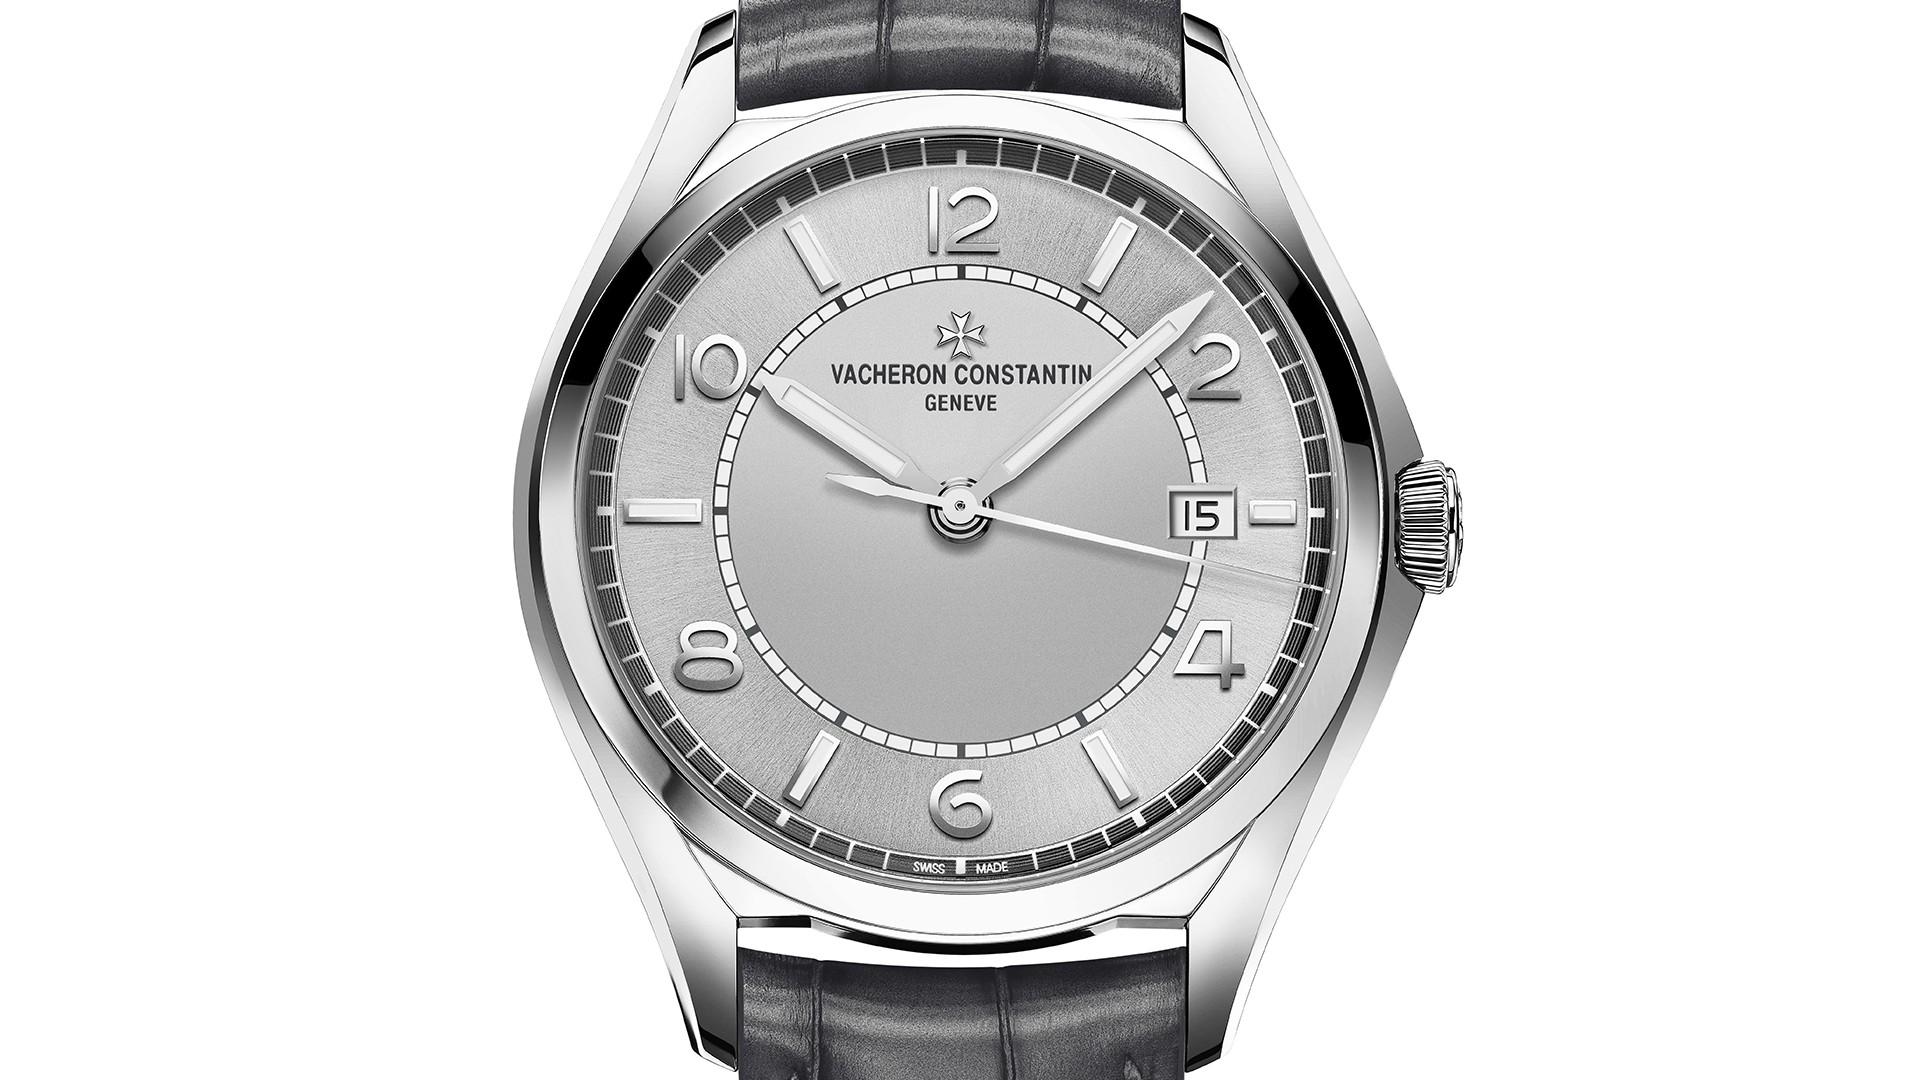 Vacheron Constantin FiftySix Self Winding watch